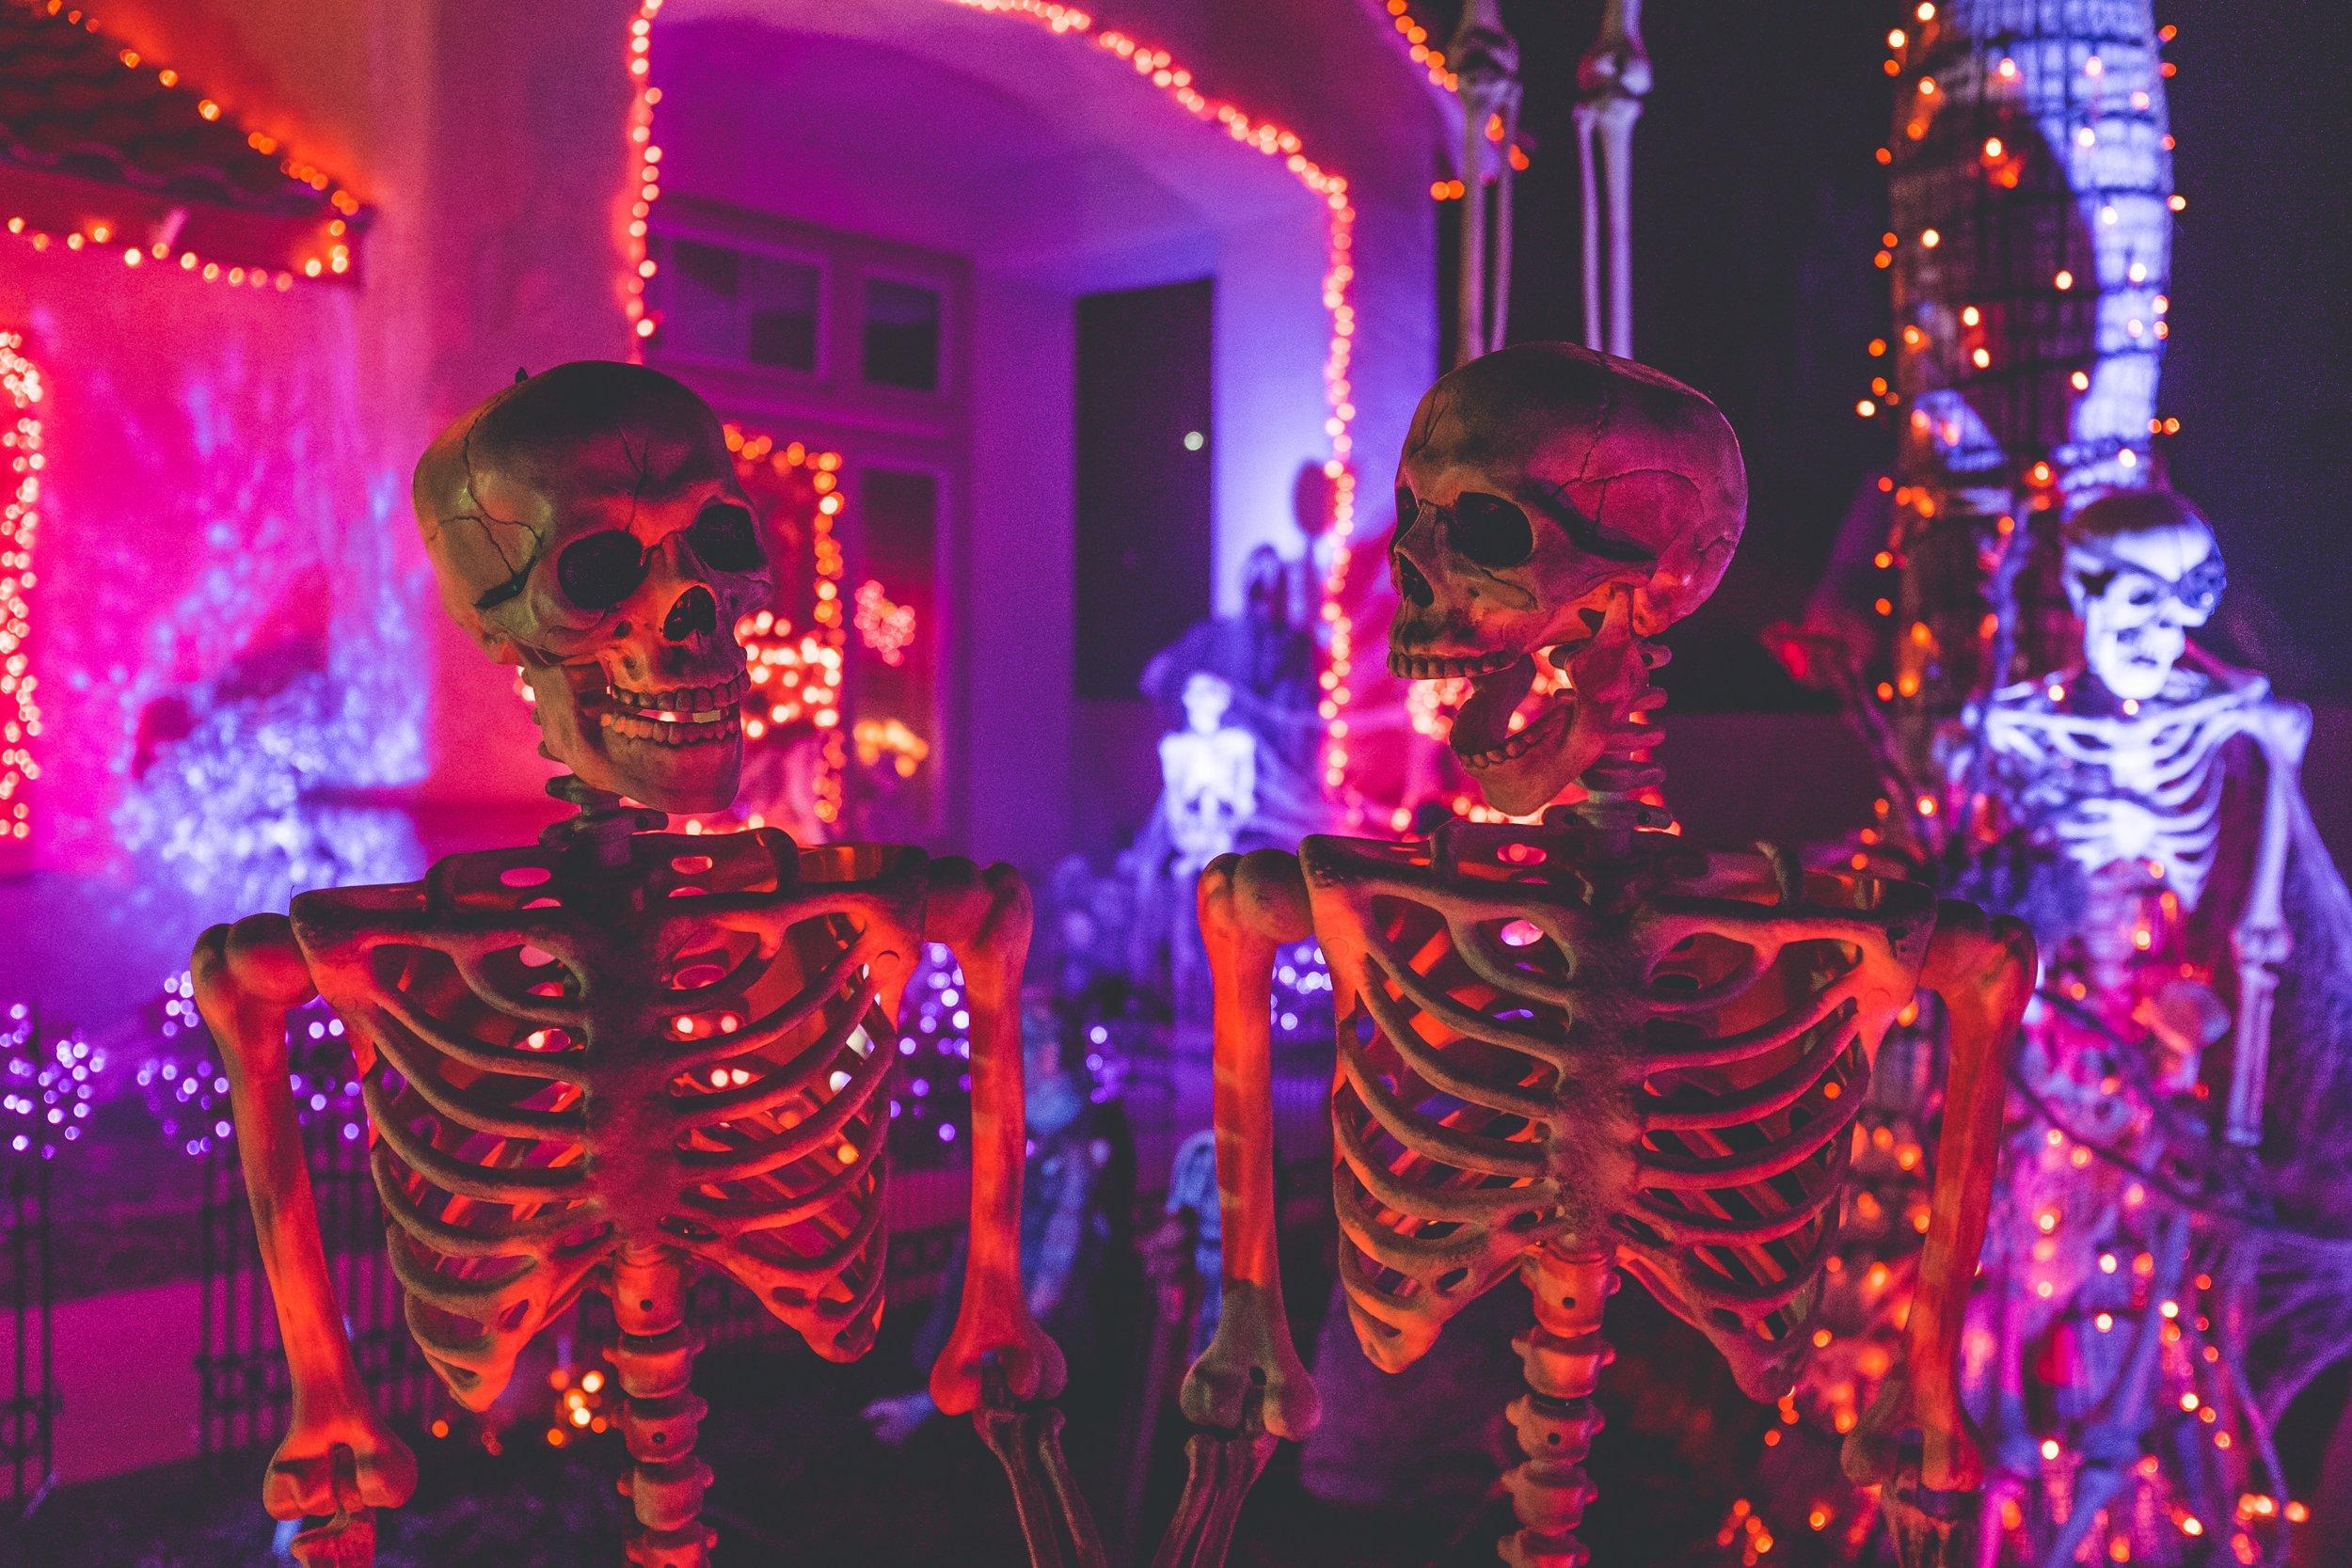 skeletons, halloween neonbrand-432965-unsplash.jpg